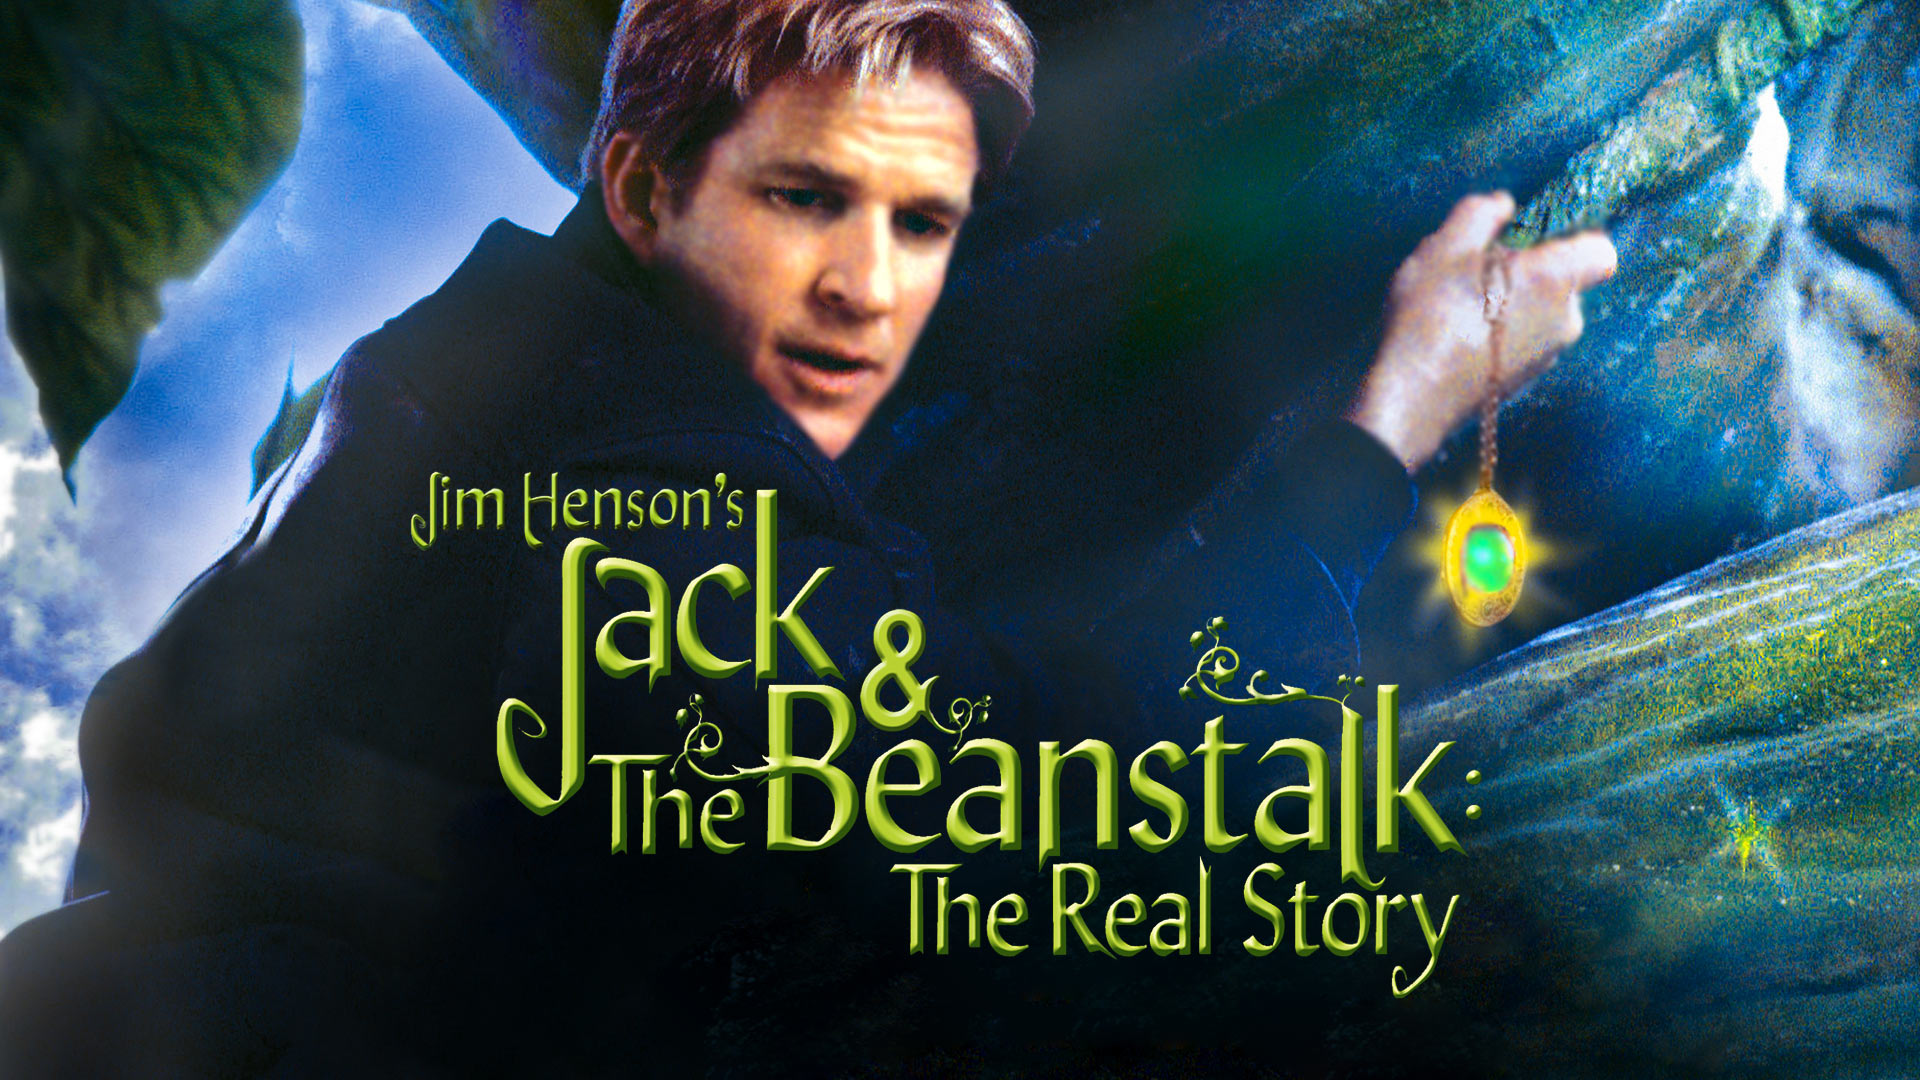 Jim Henson's Jack & the Beanstalk: The Real Story Season 1